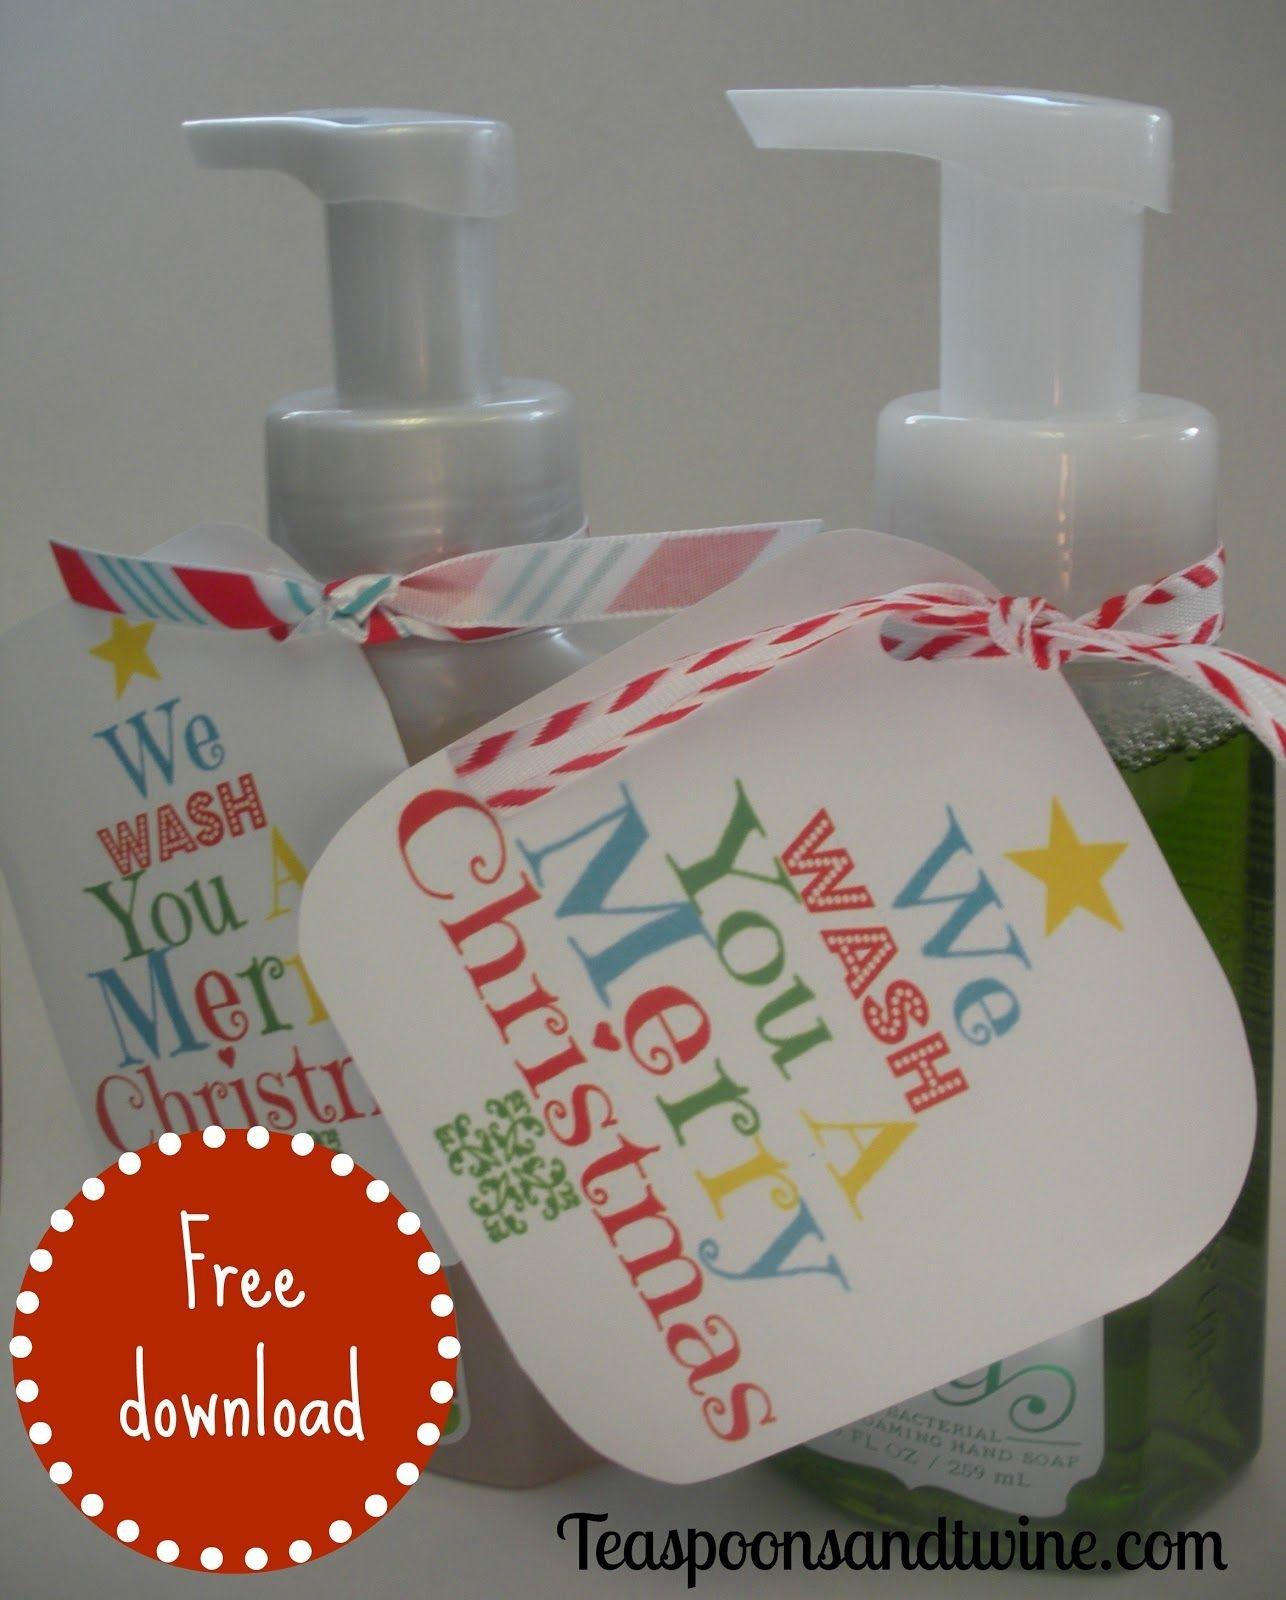 Cute Christmas Gift Idea | Christmas | Feliz Navidad, Regalos - We Wash You A Merry Christmas Free Printable